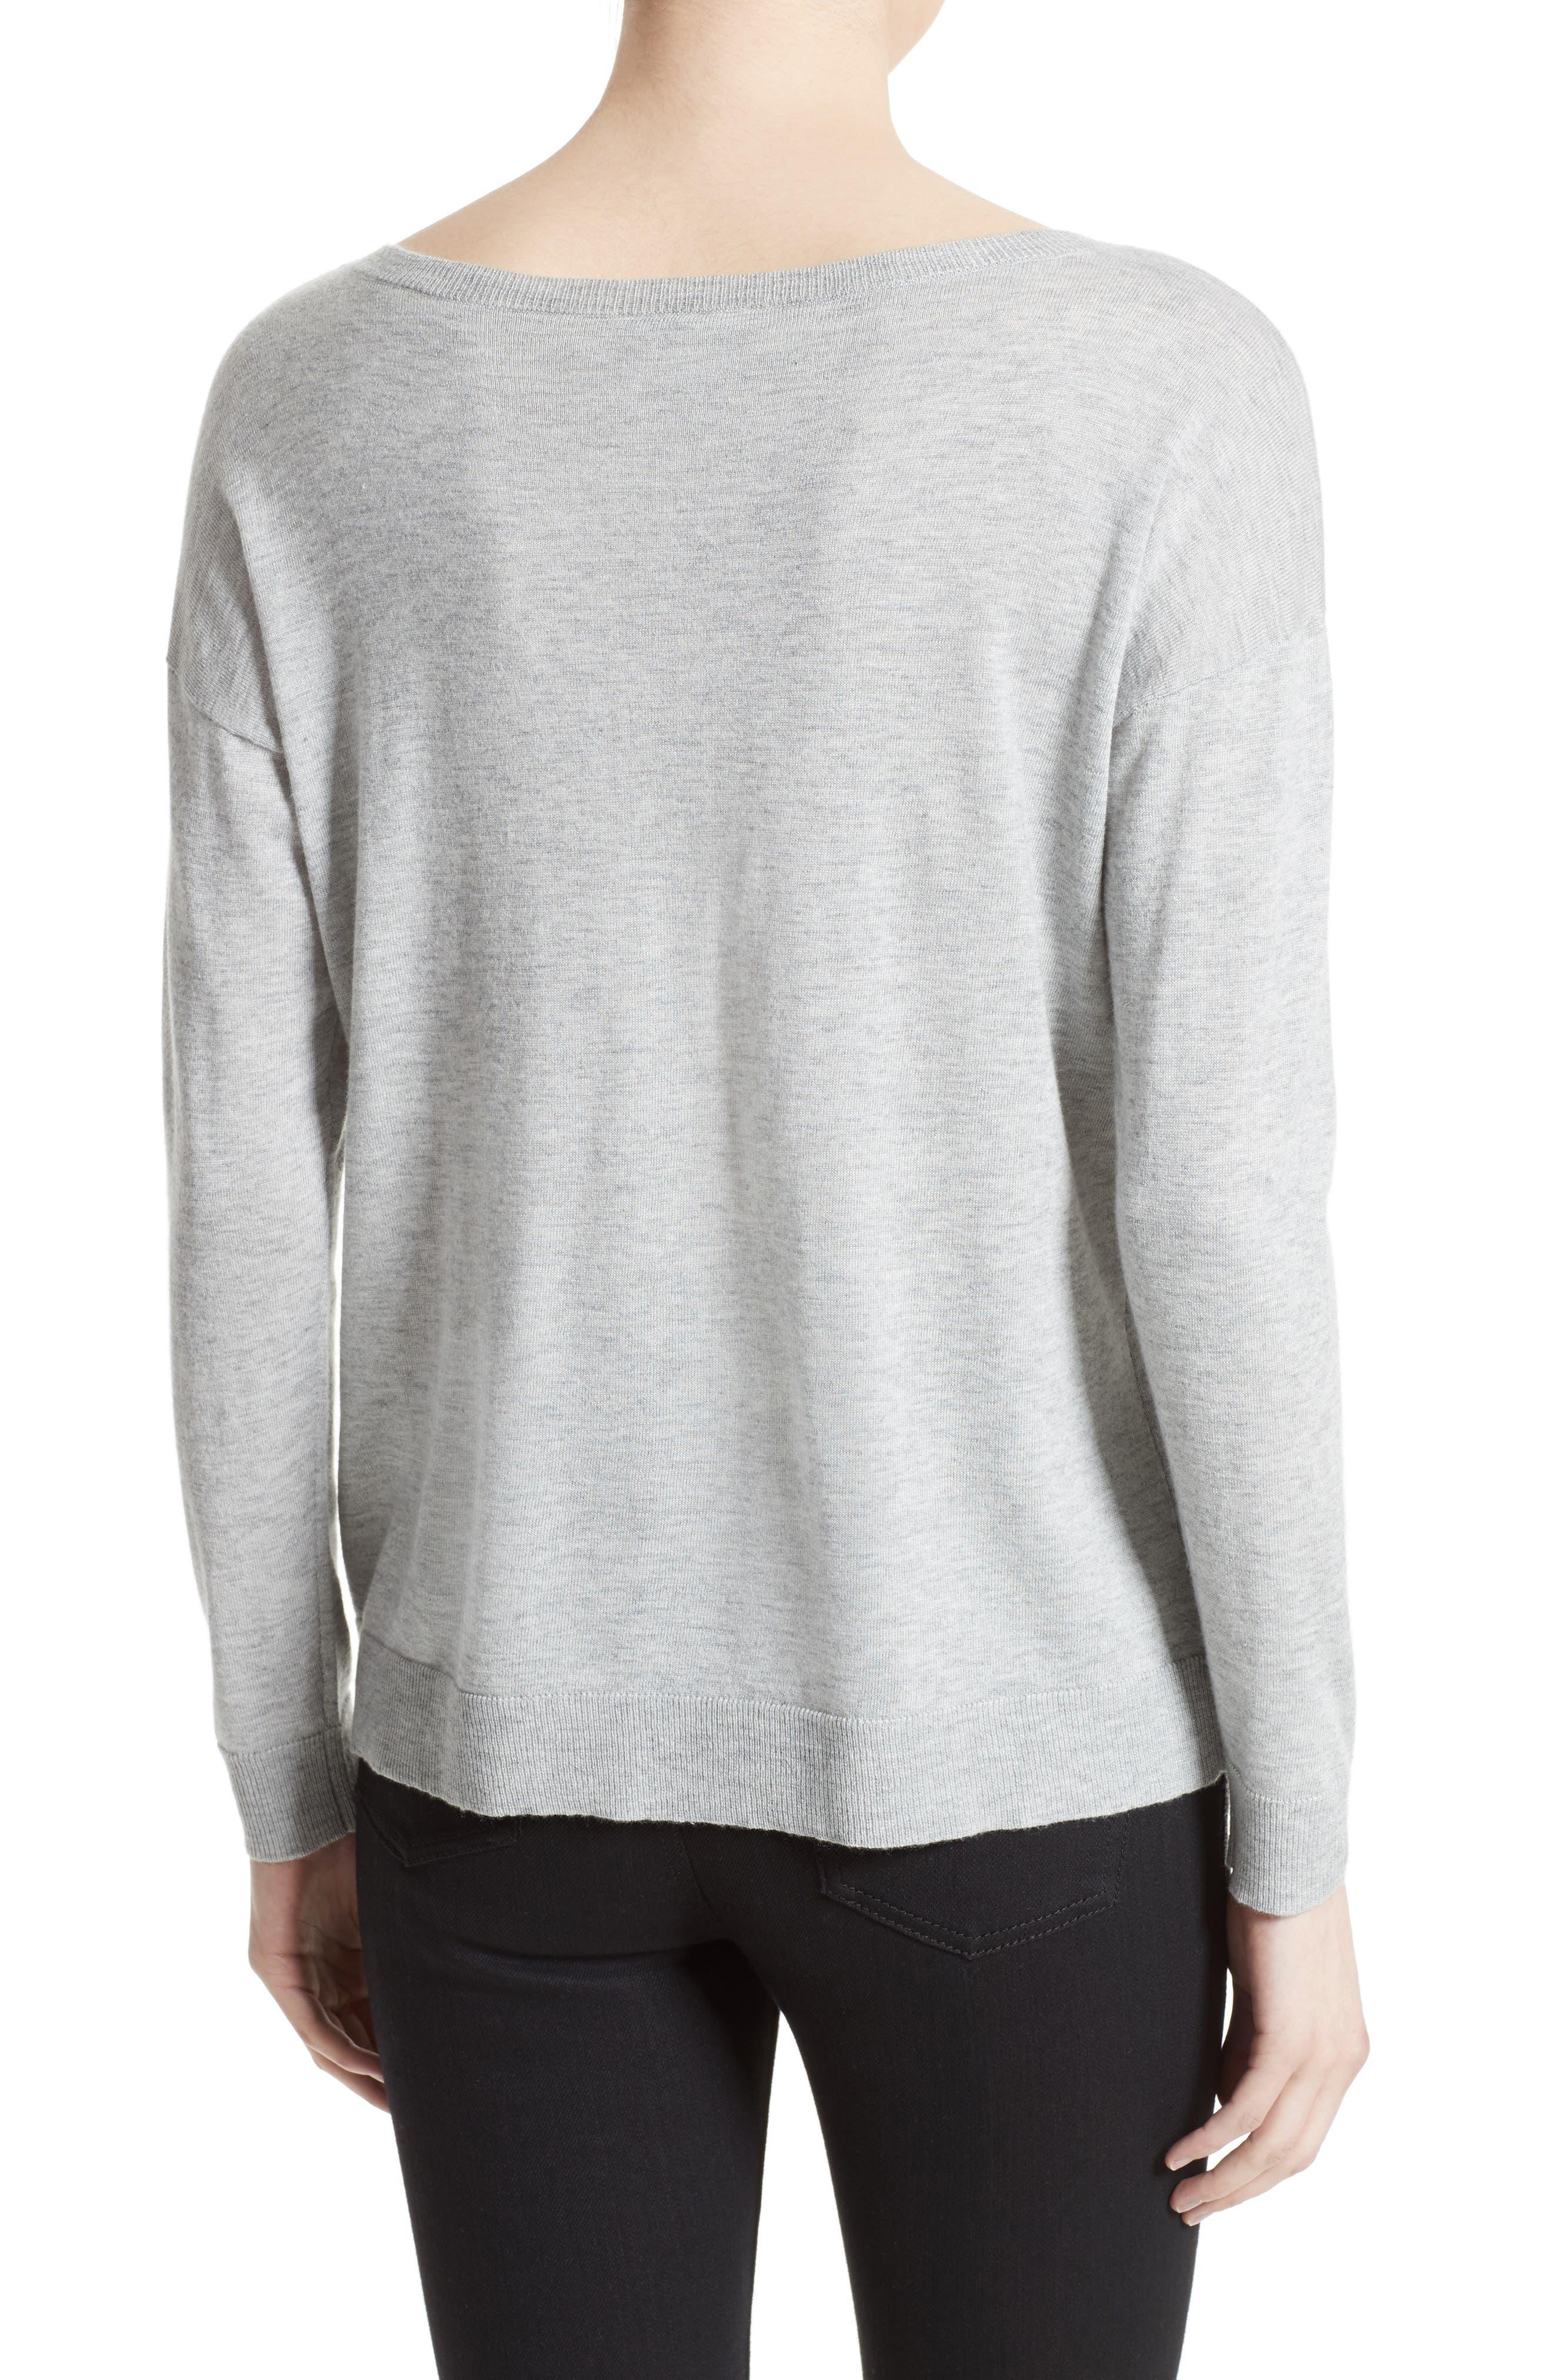 JOIE,                             Eloisa Sweater,                             Alternate thumbnail 2, color,                             051